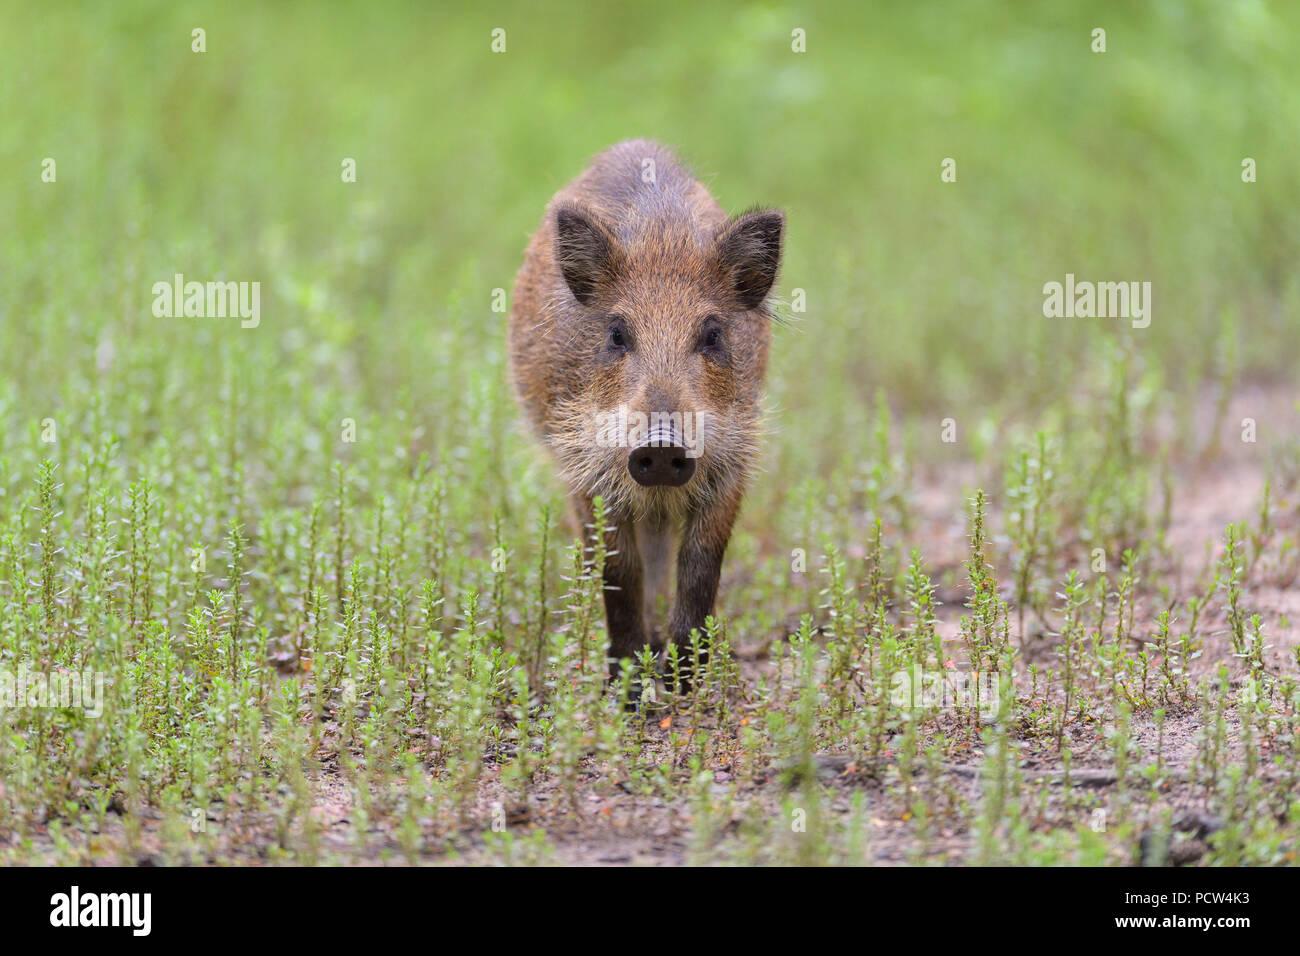 Wild boar, Sus scrofa, Hesse, Germany, Europe - Stock Image